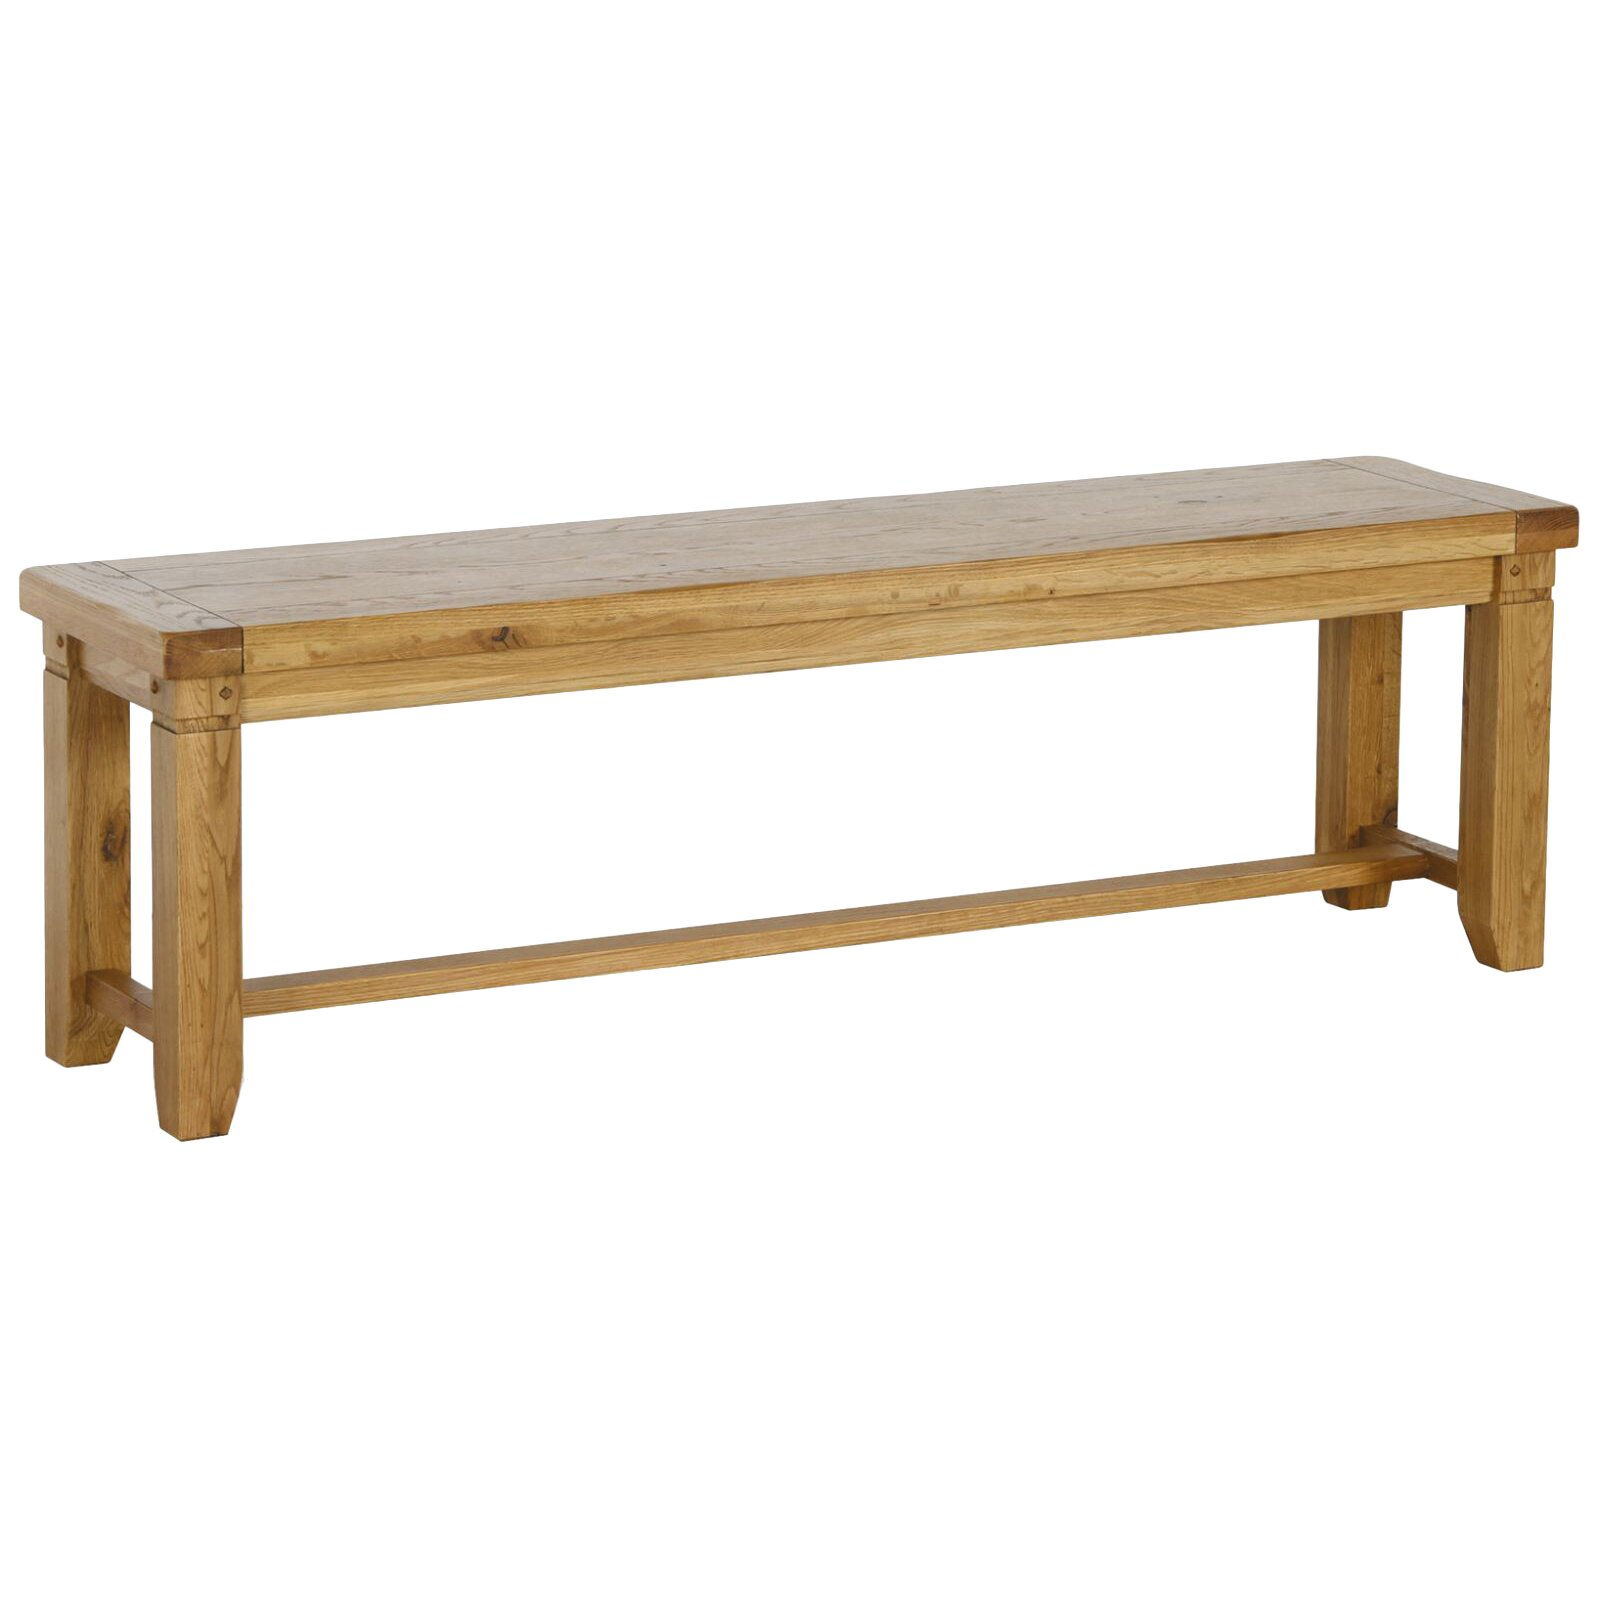 AlpenHome Oceaner Wood Kitchen Bench & Reviews